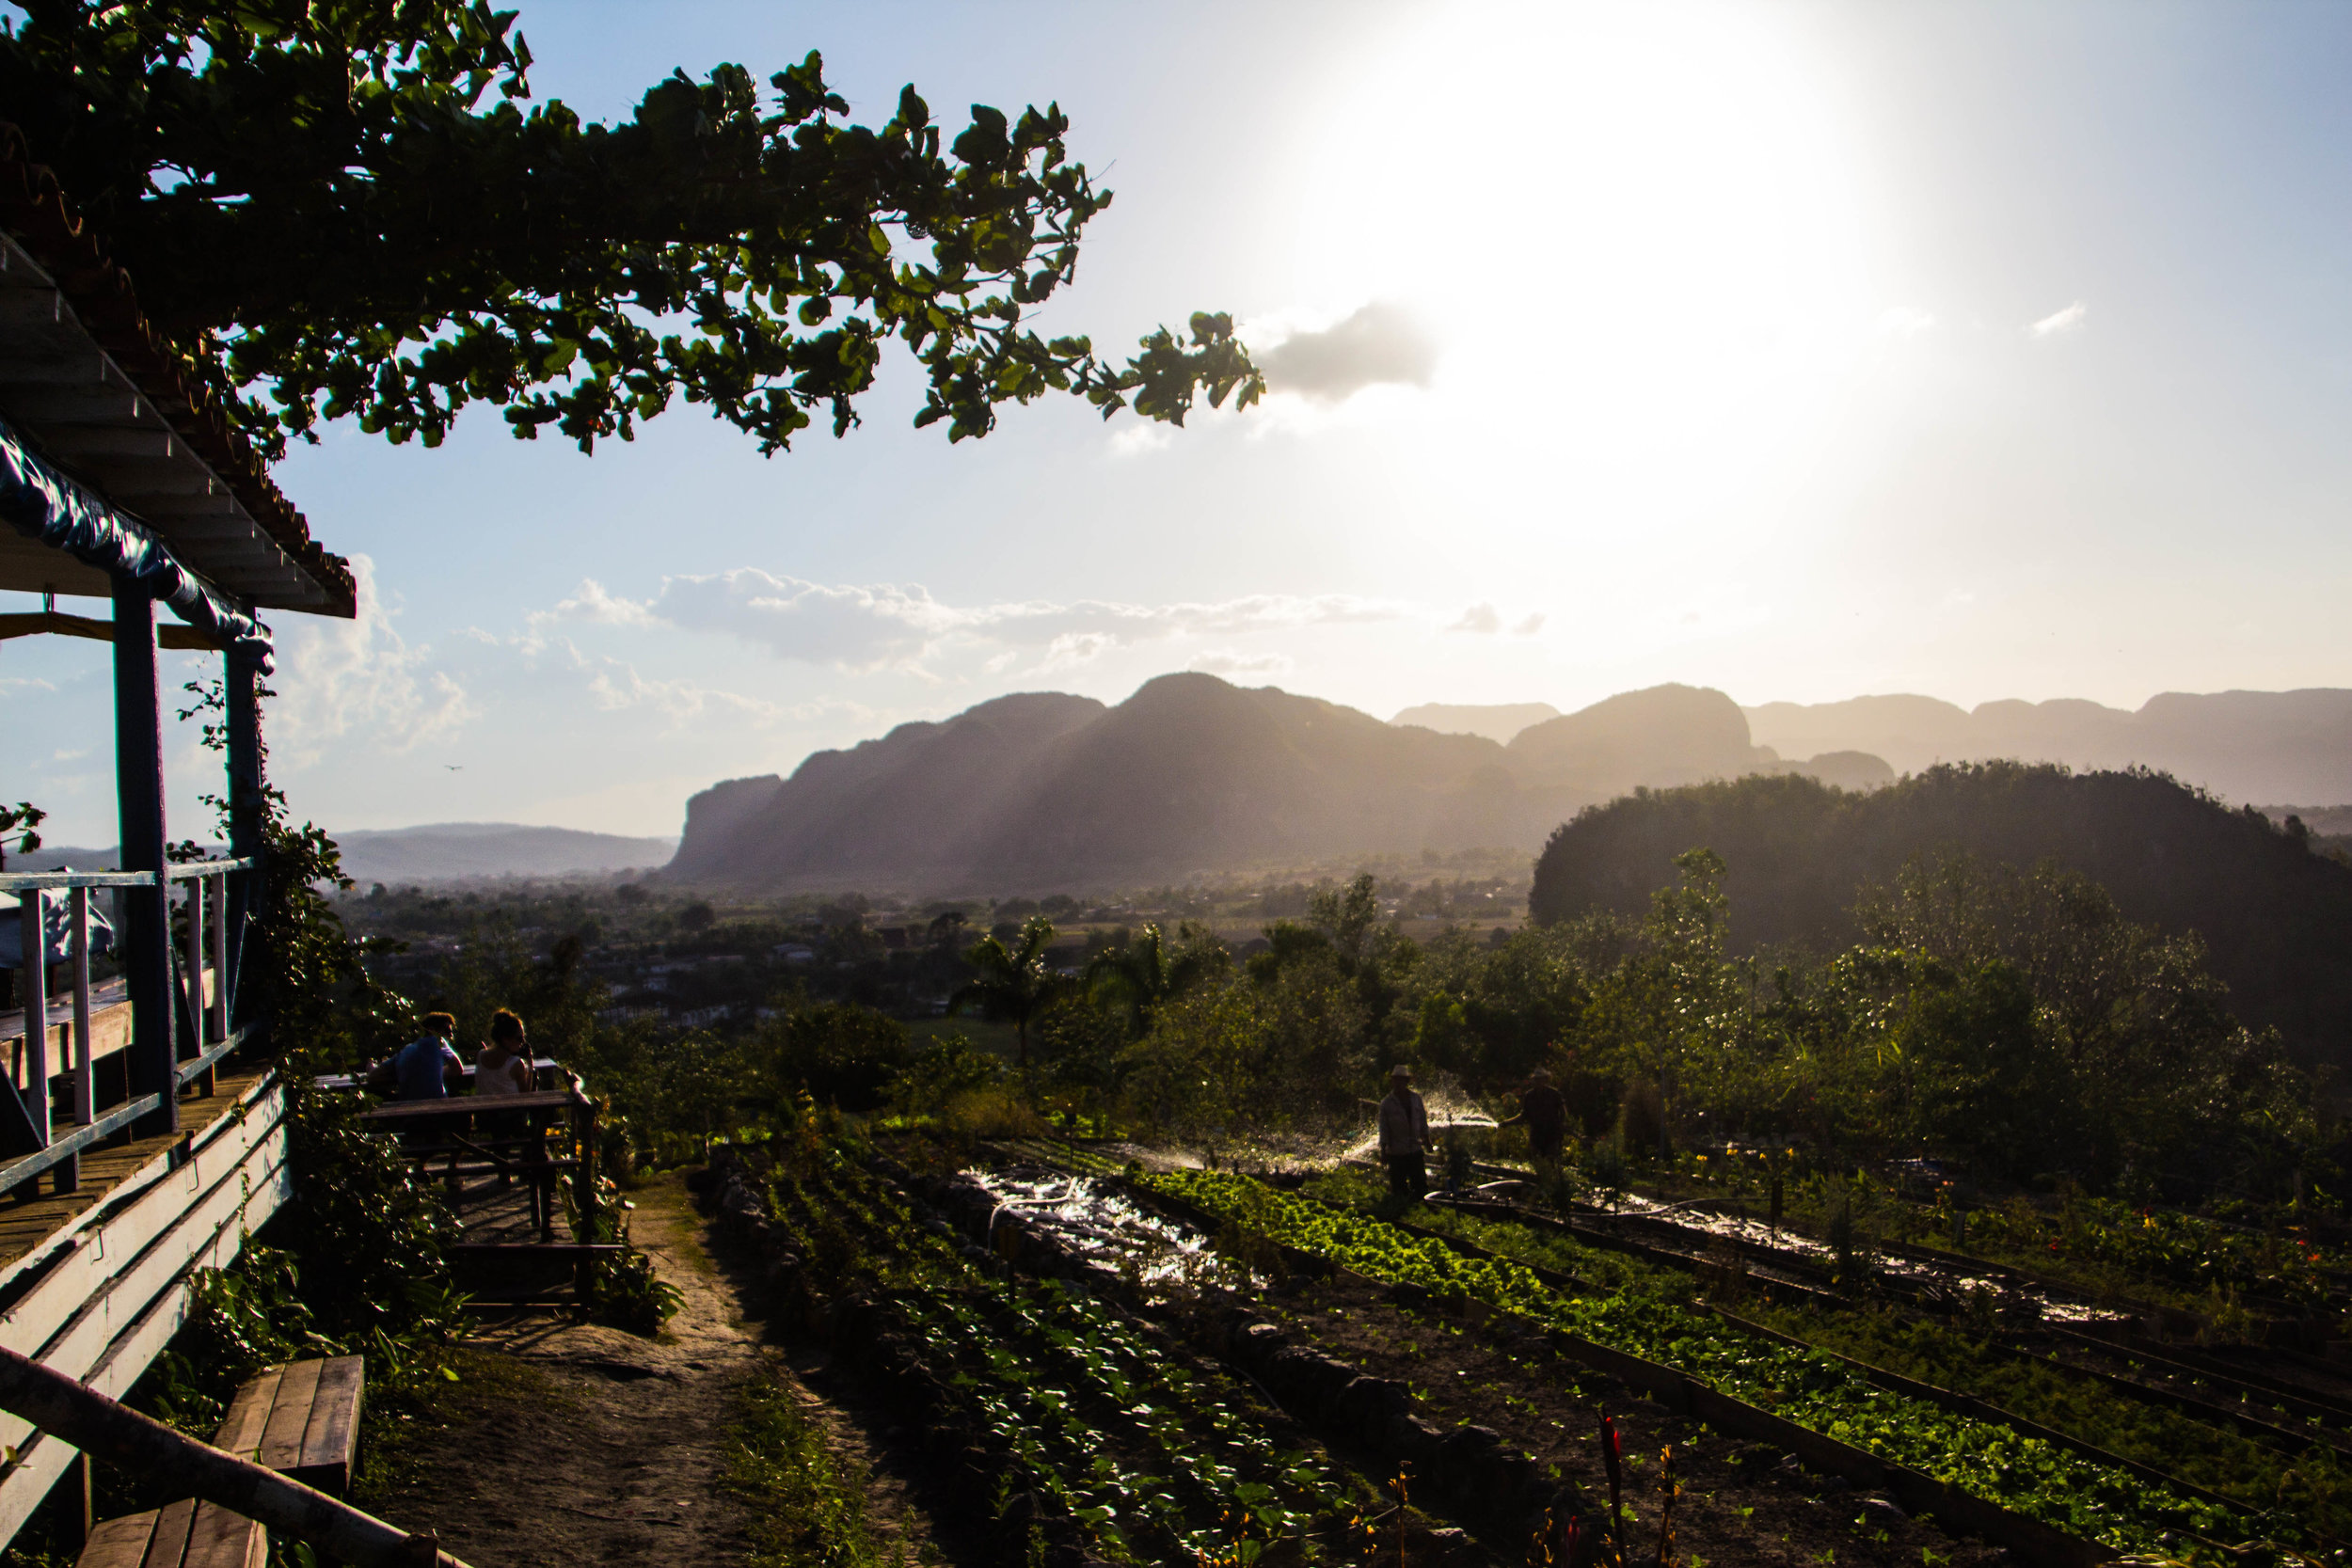 finca agroecological el paraiso restaurant viñales cuba-1-5-2.jpg